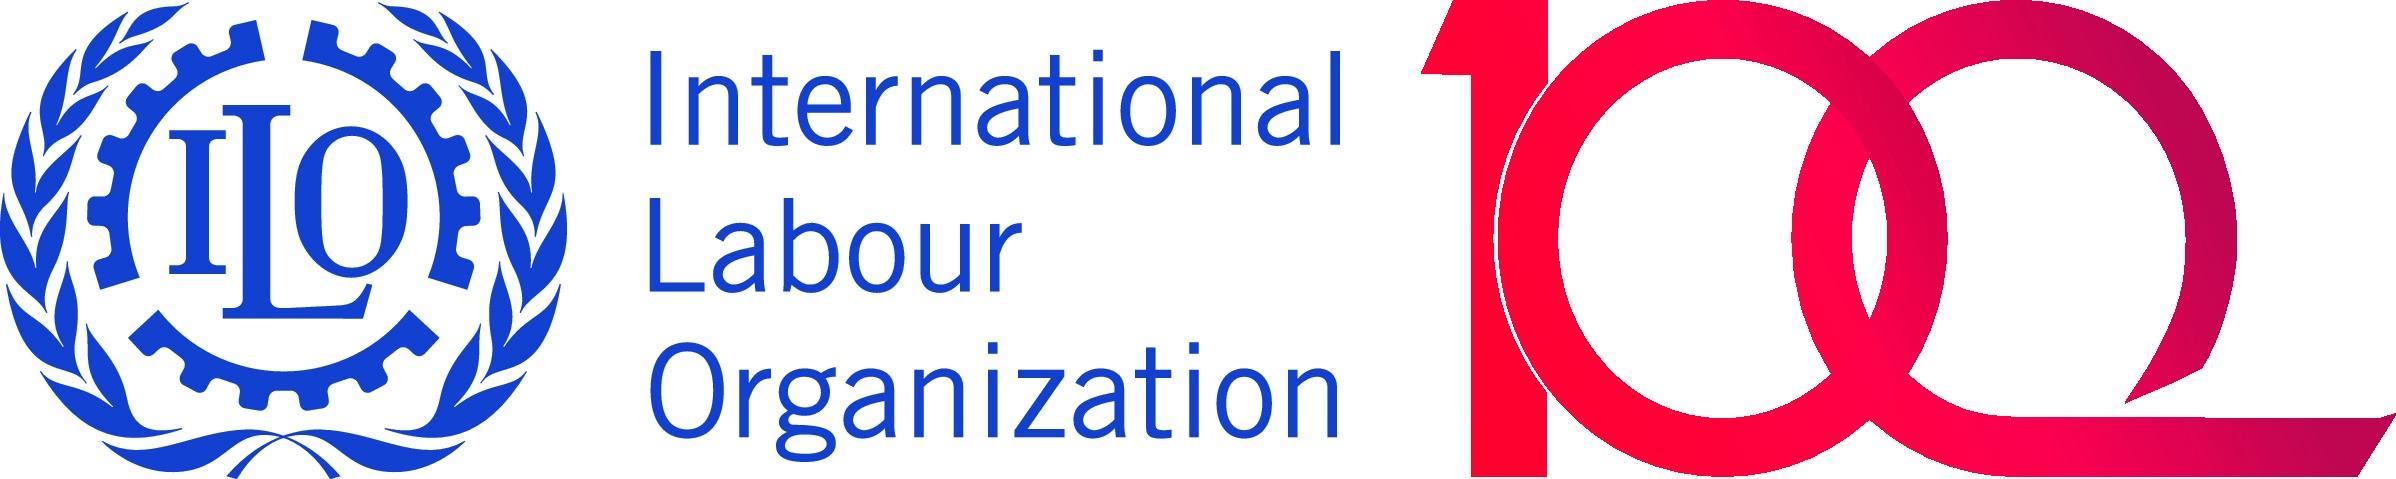 ILO100_digital_web_EN.eps